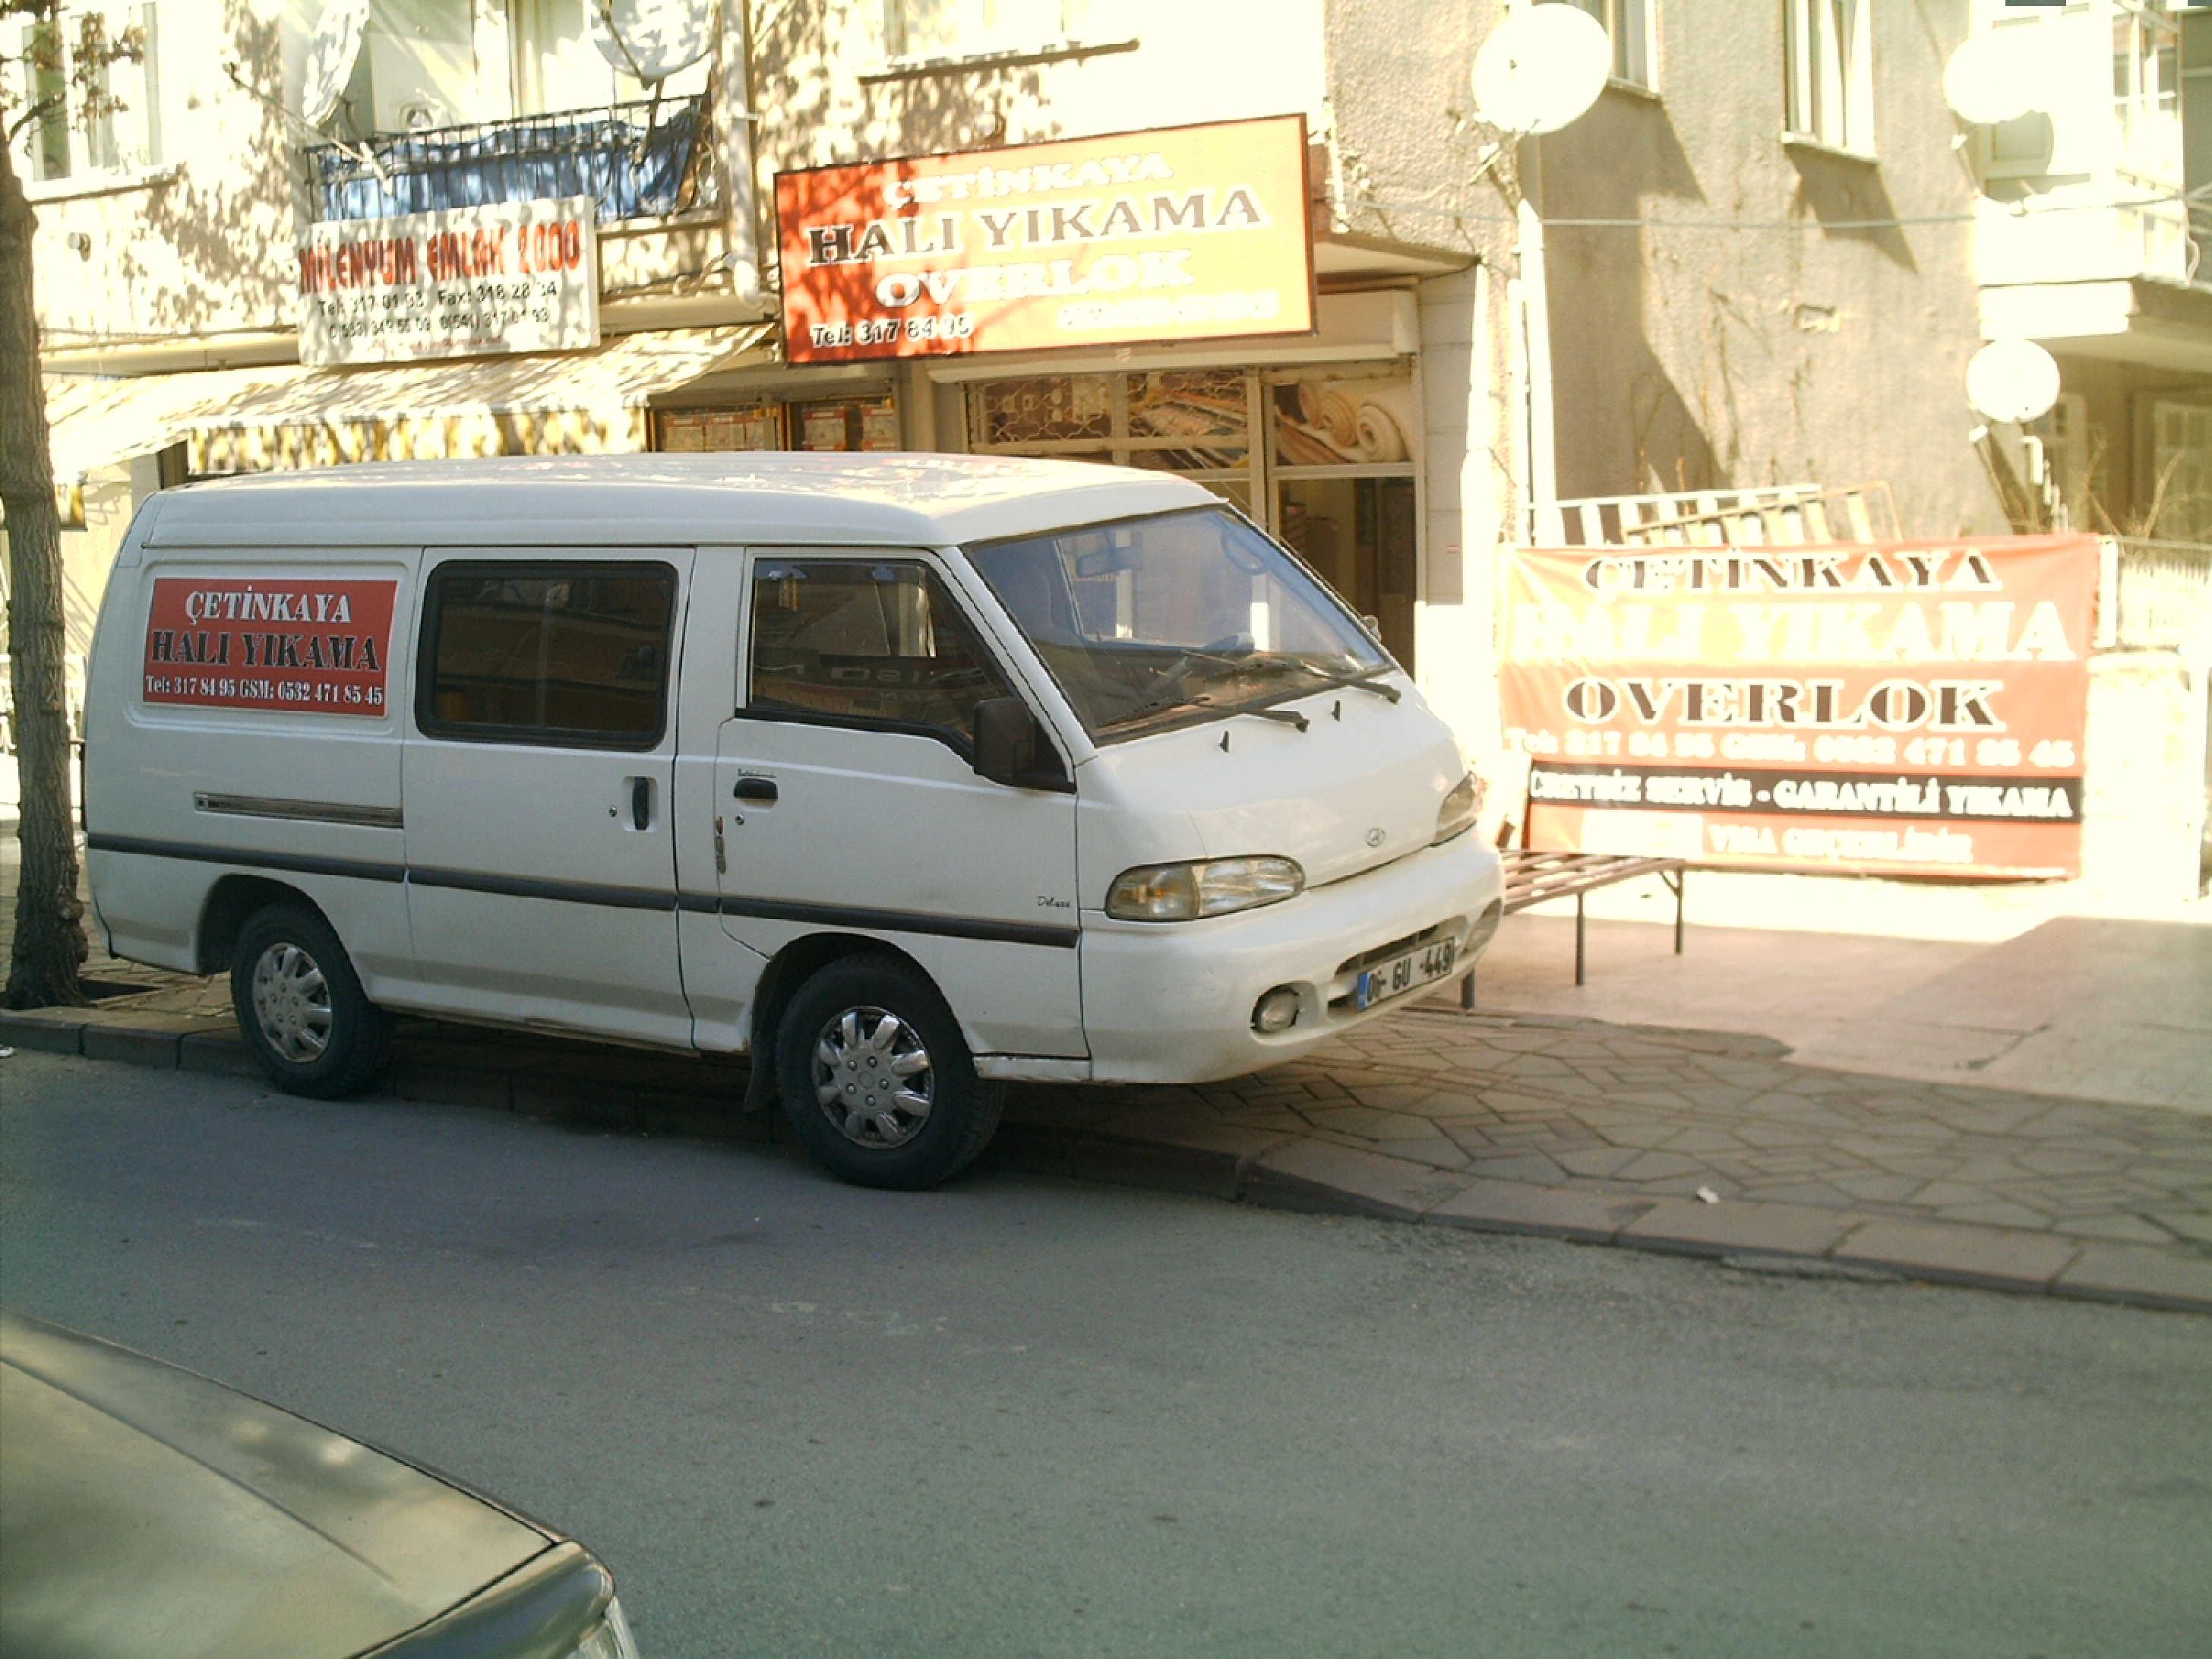 ahiler_hali_yikama_servis